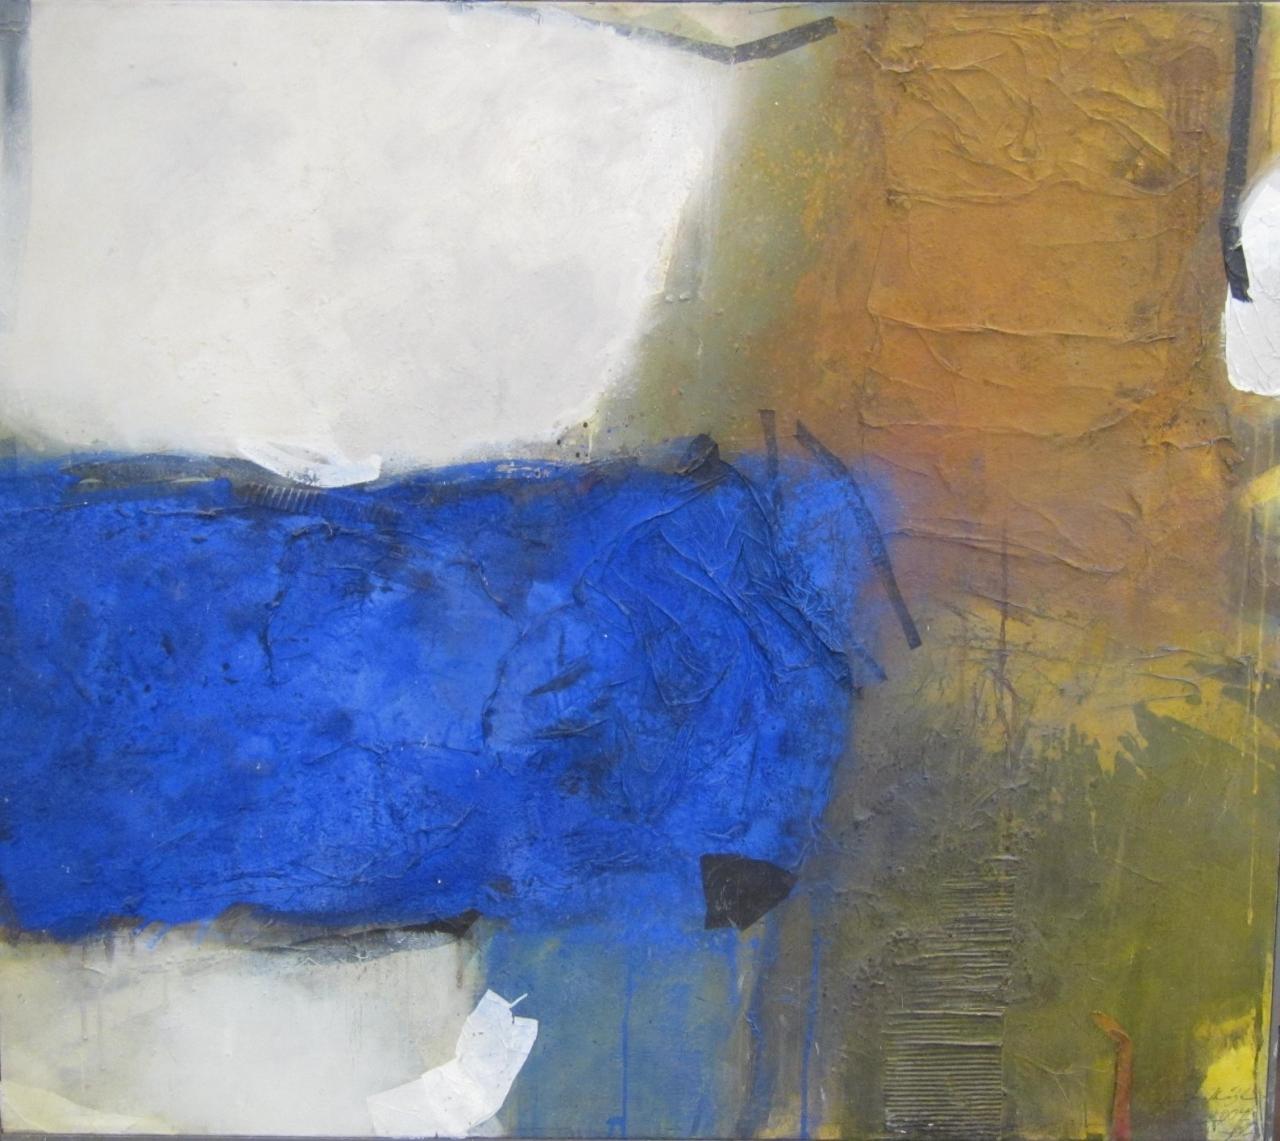 o.T. (abstrakte Komposition) 140 x 160